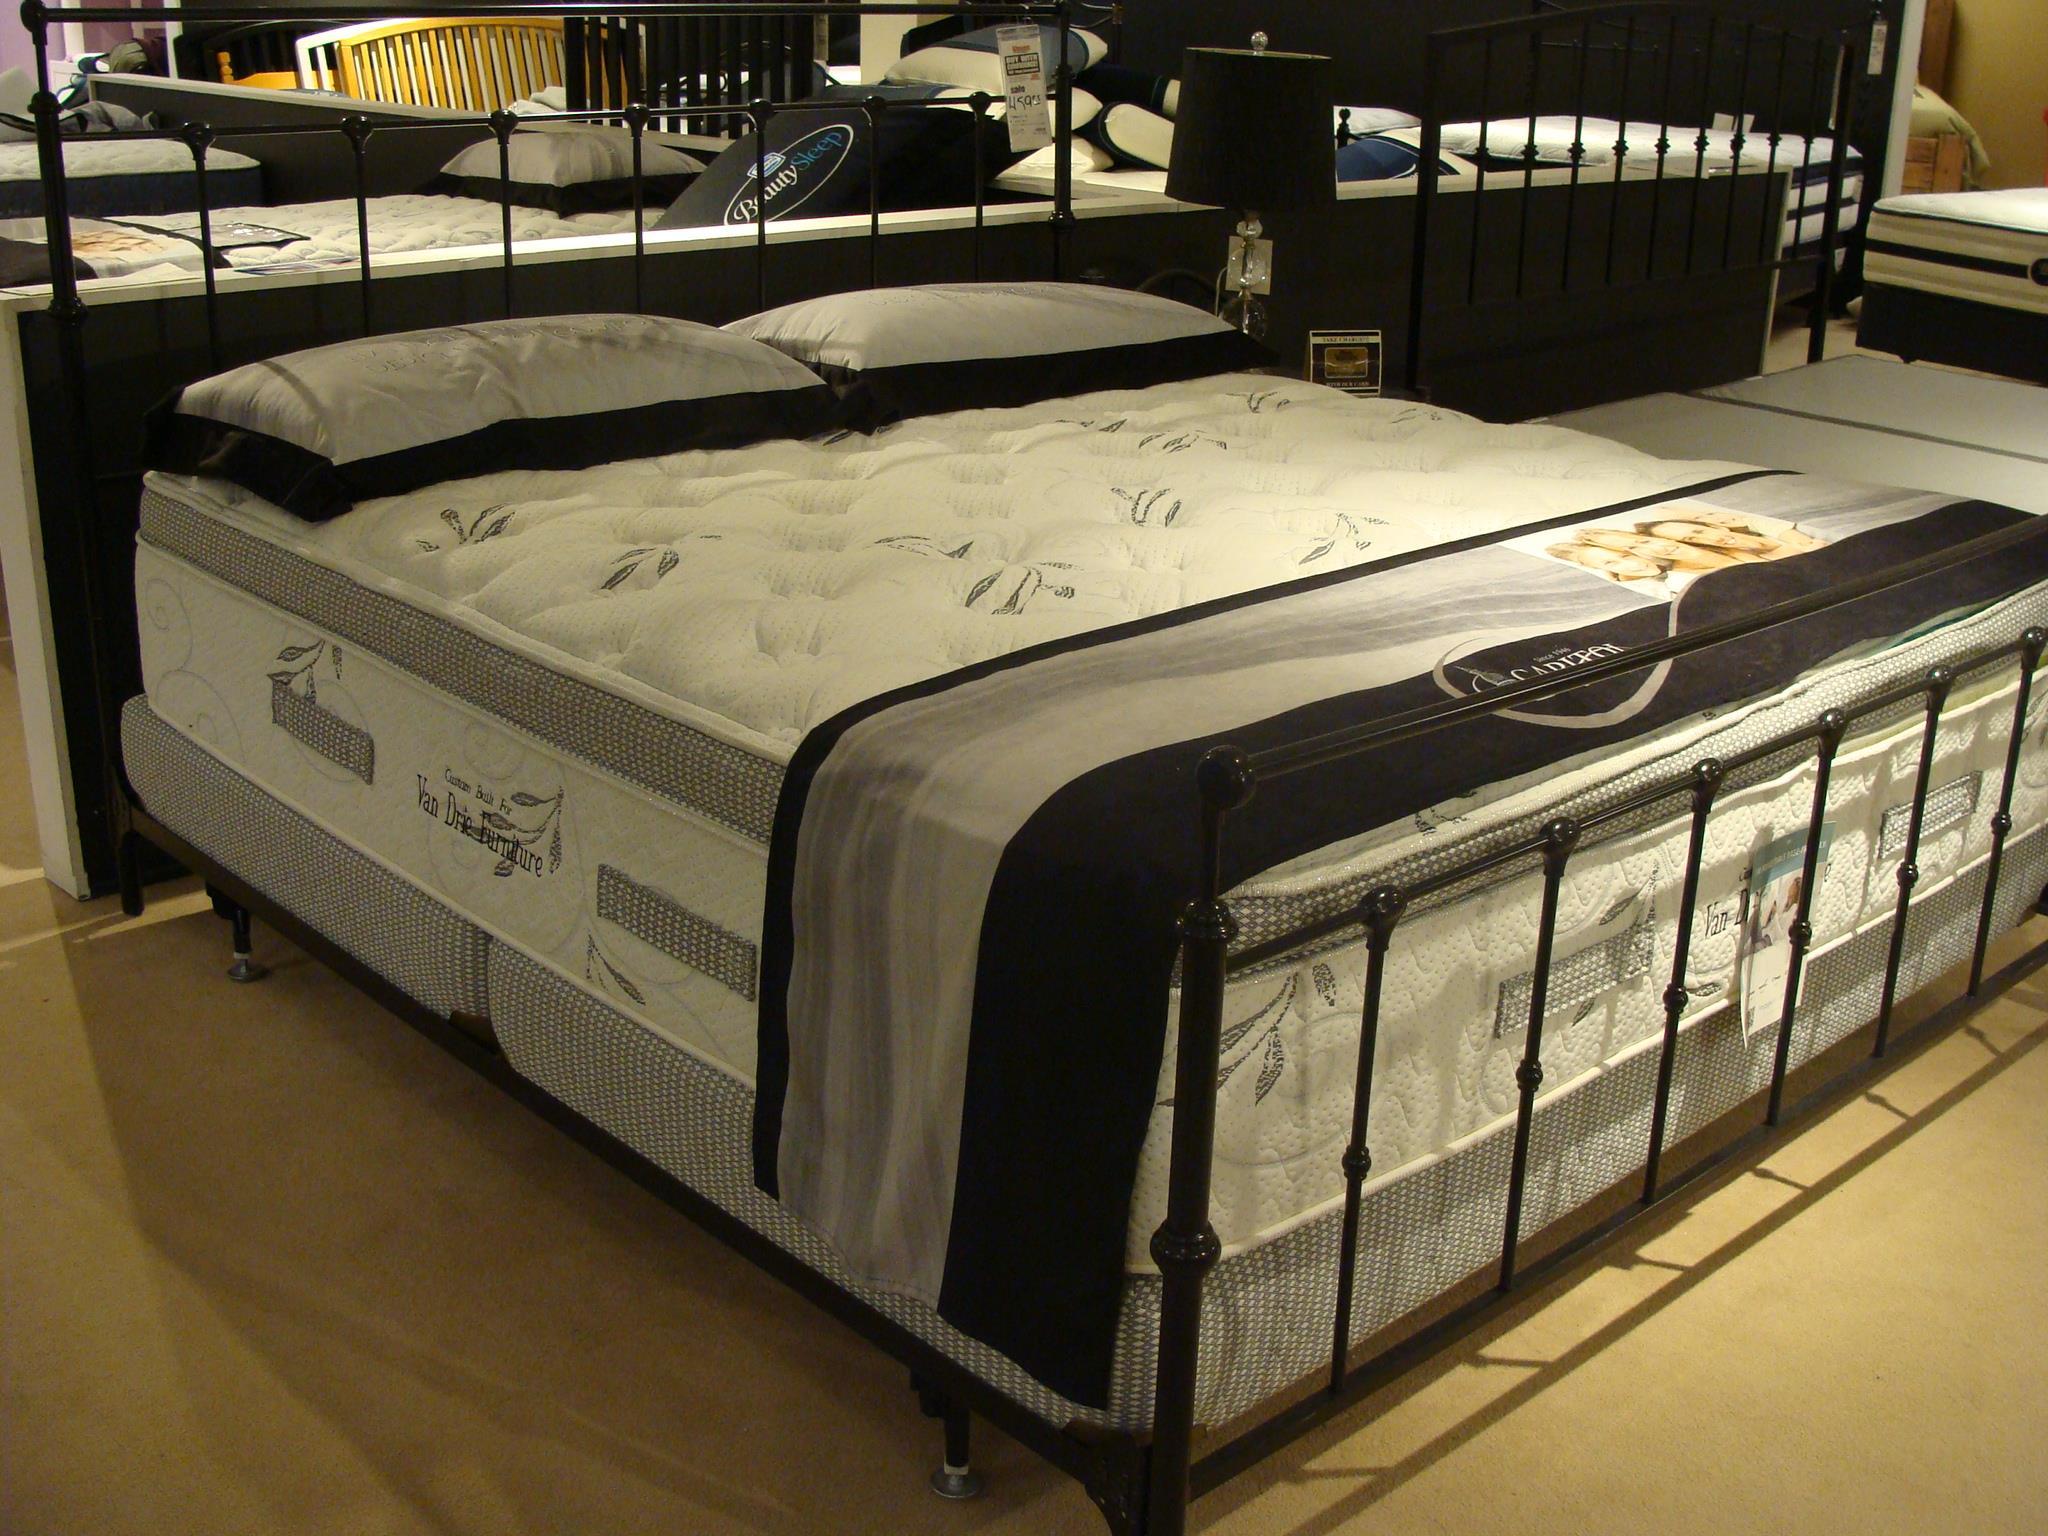 Capitol Bedding Opulence King Mattress Only - Item Number: PillowTop-K